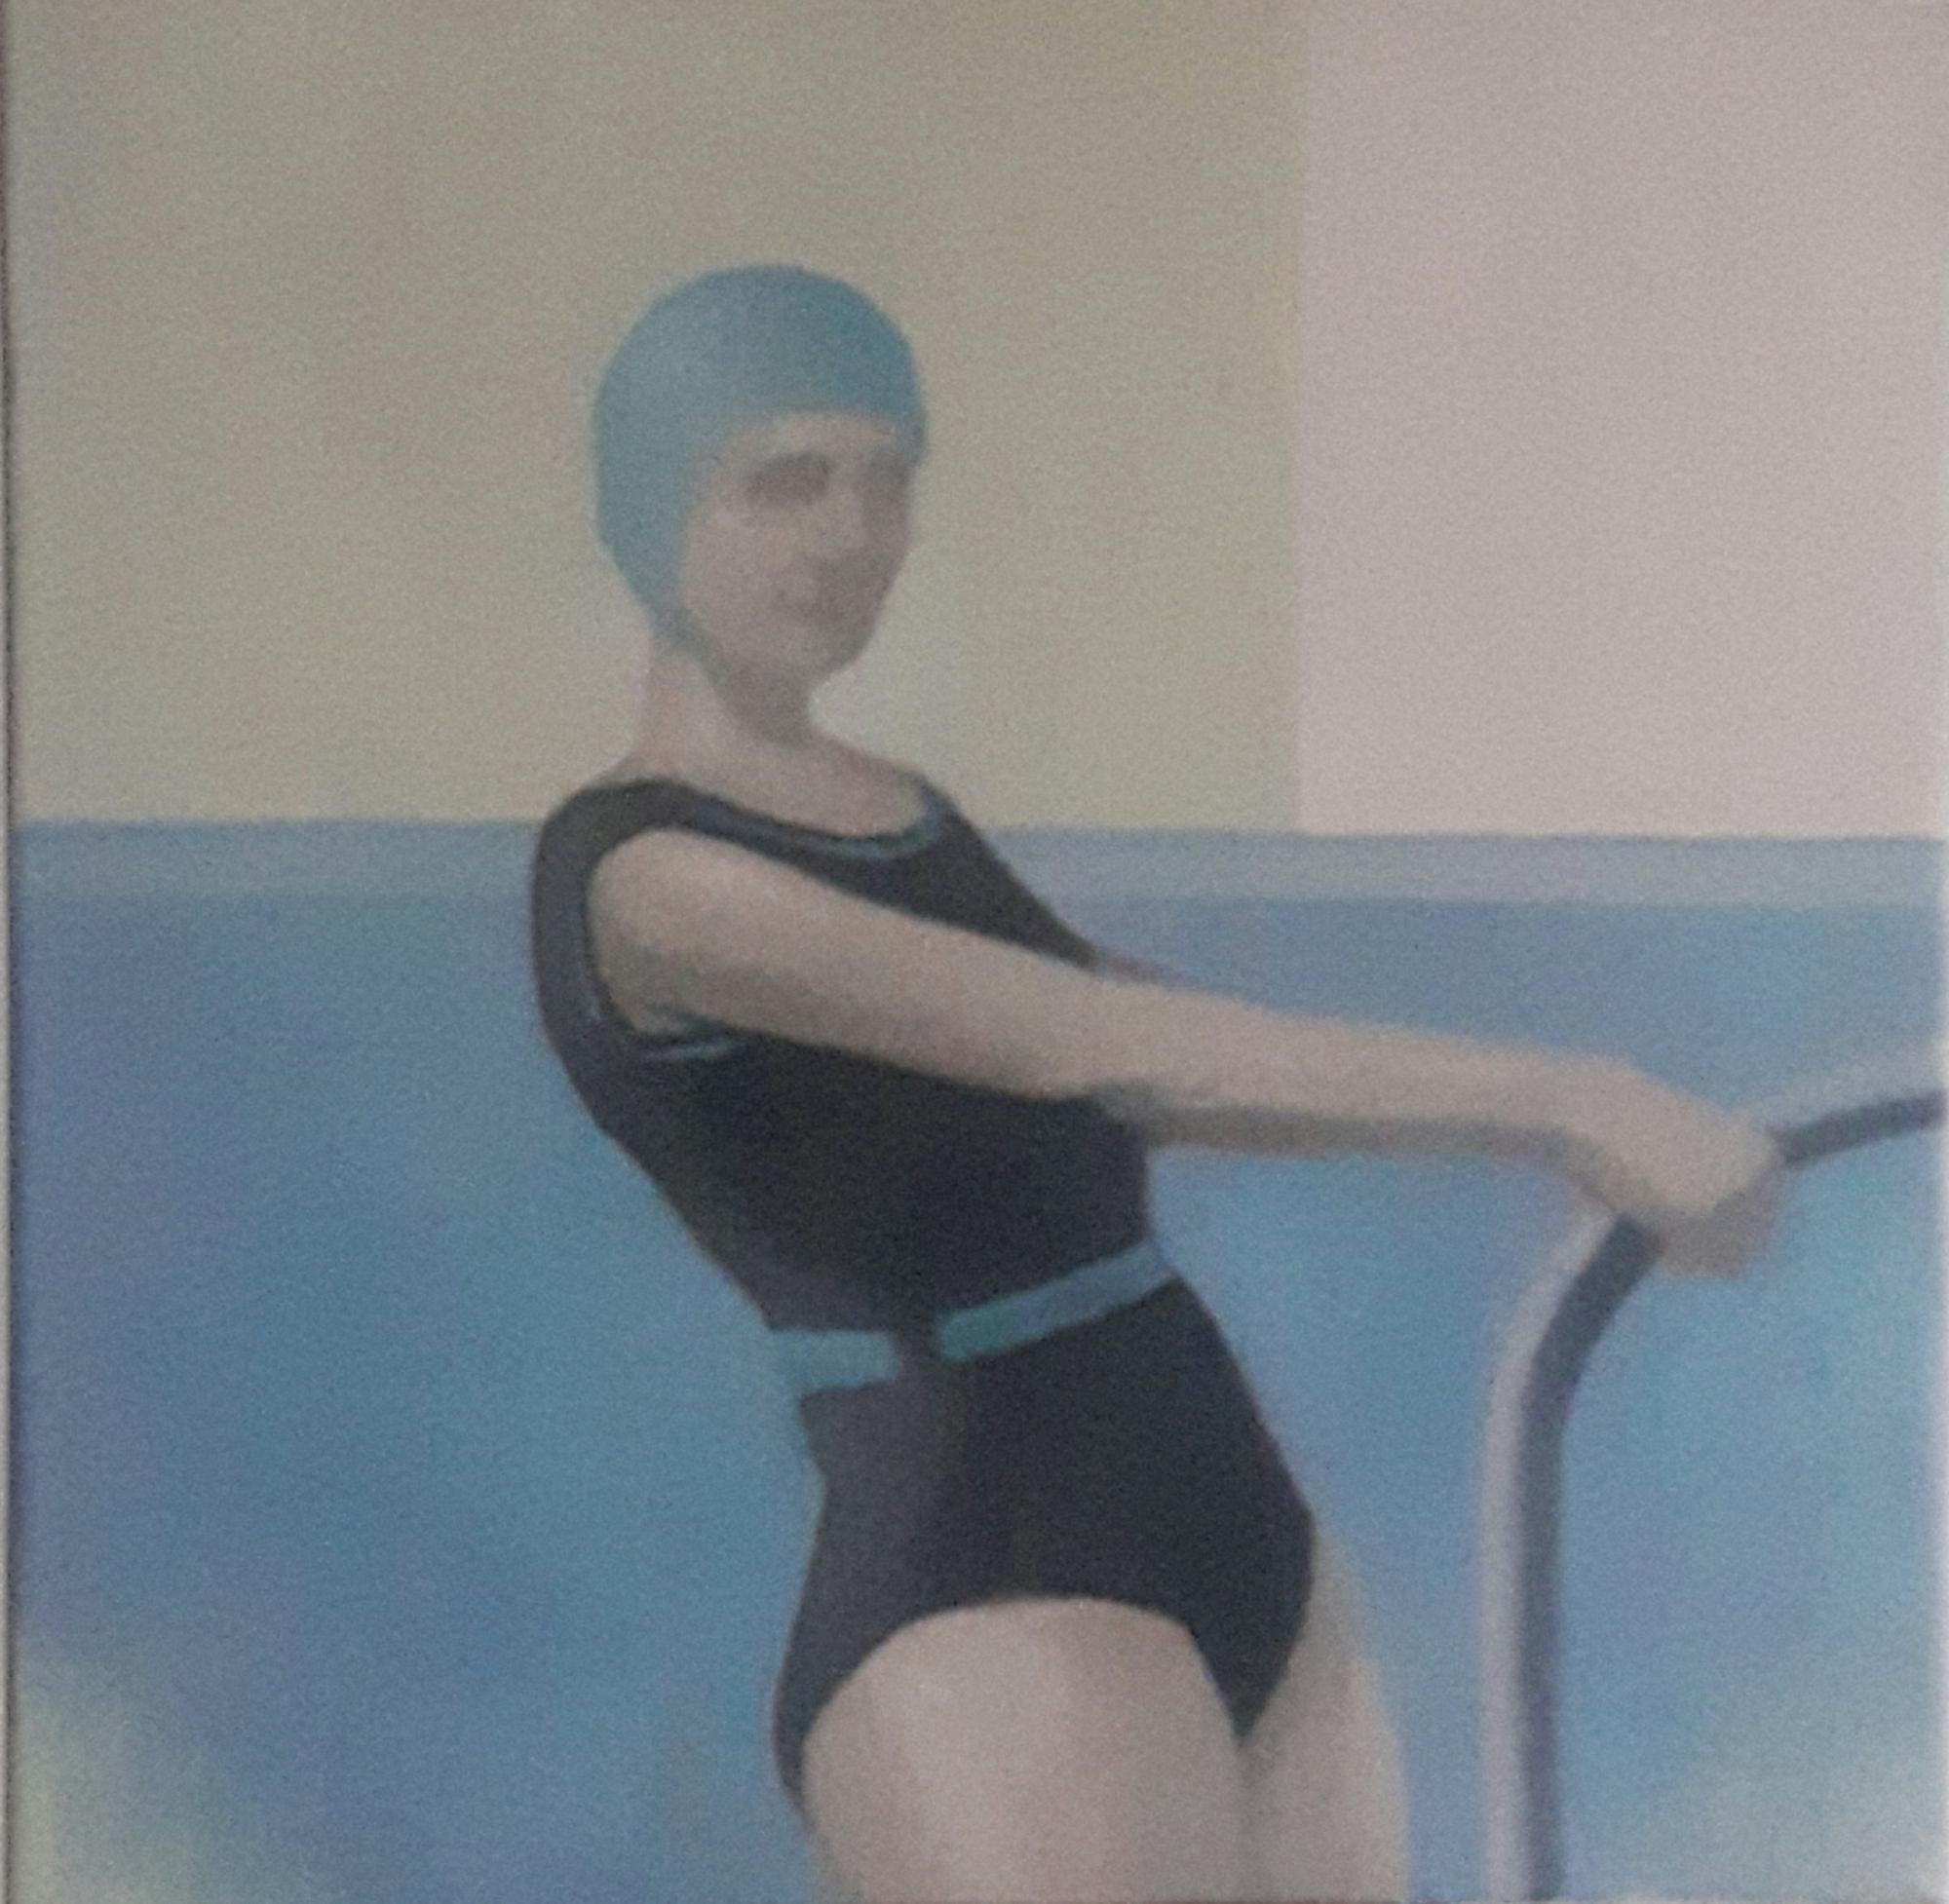 Blue Bathing Cap  by Greg Nordoff